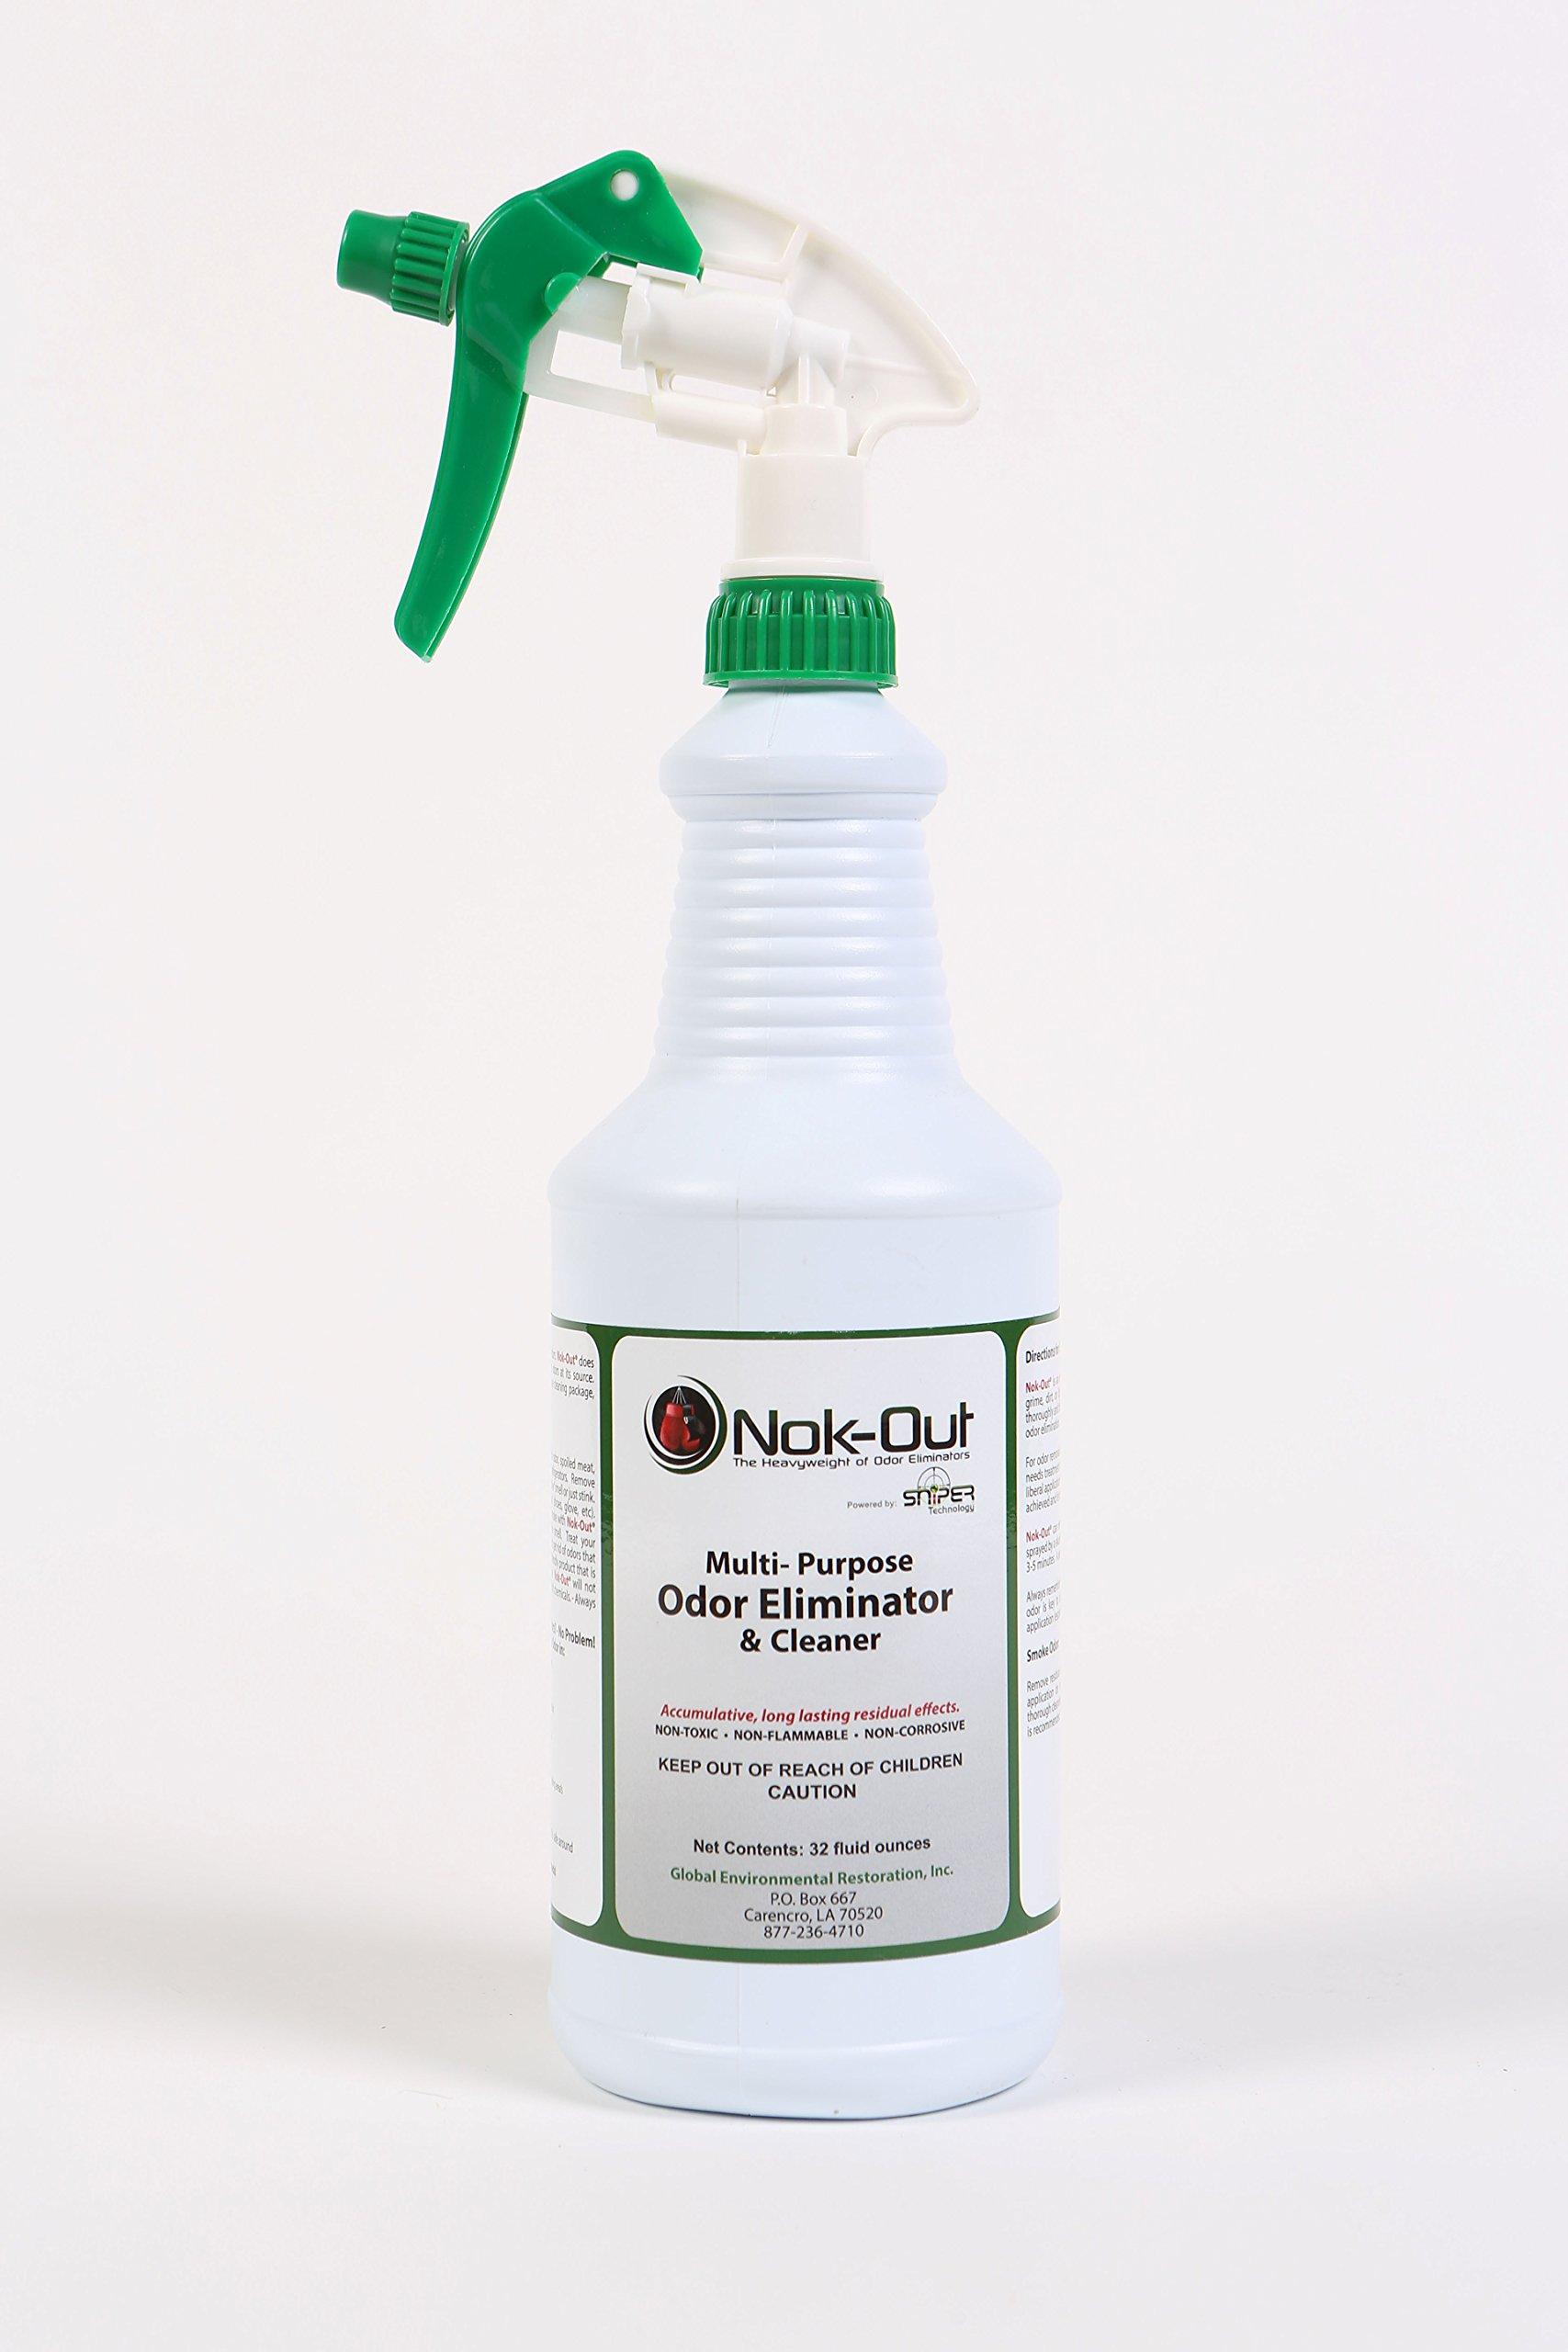 Nok-Out Odor Eliminator, 32 Oz Trigger Spray, Multi-Purpose Odor Eliminator